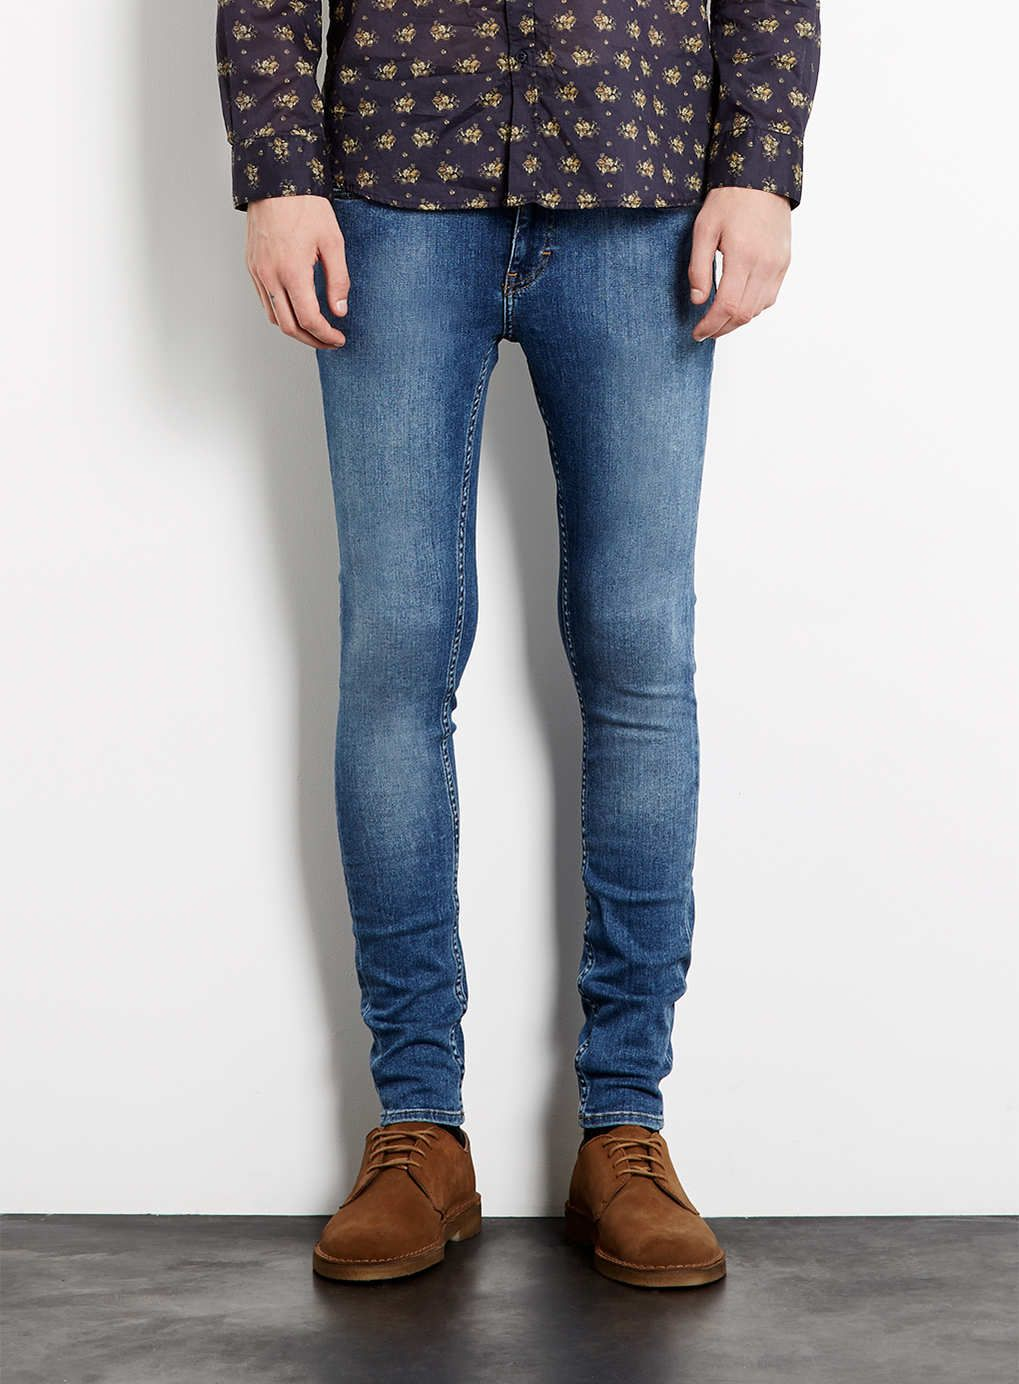 Topman Spray On Skinny Jeans advise